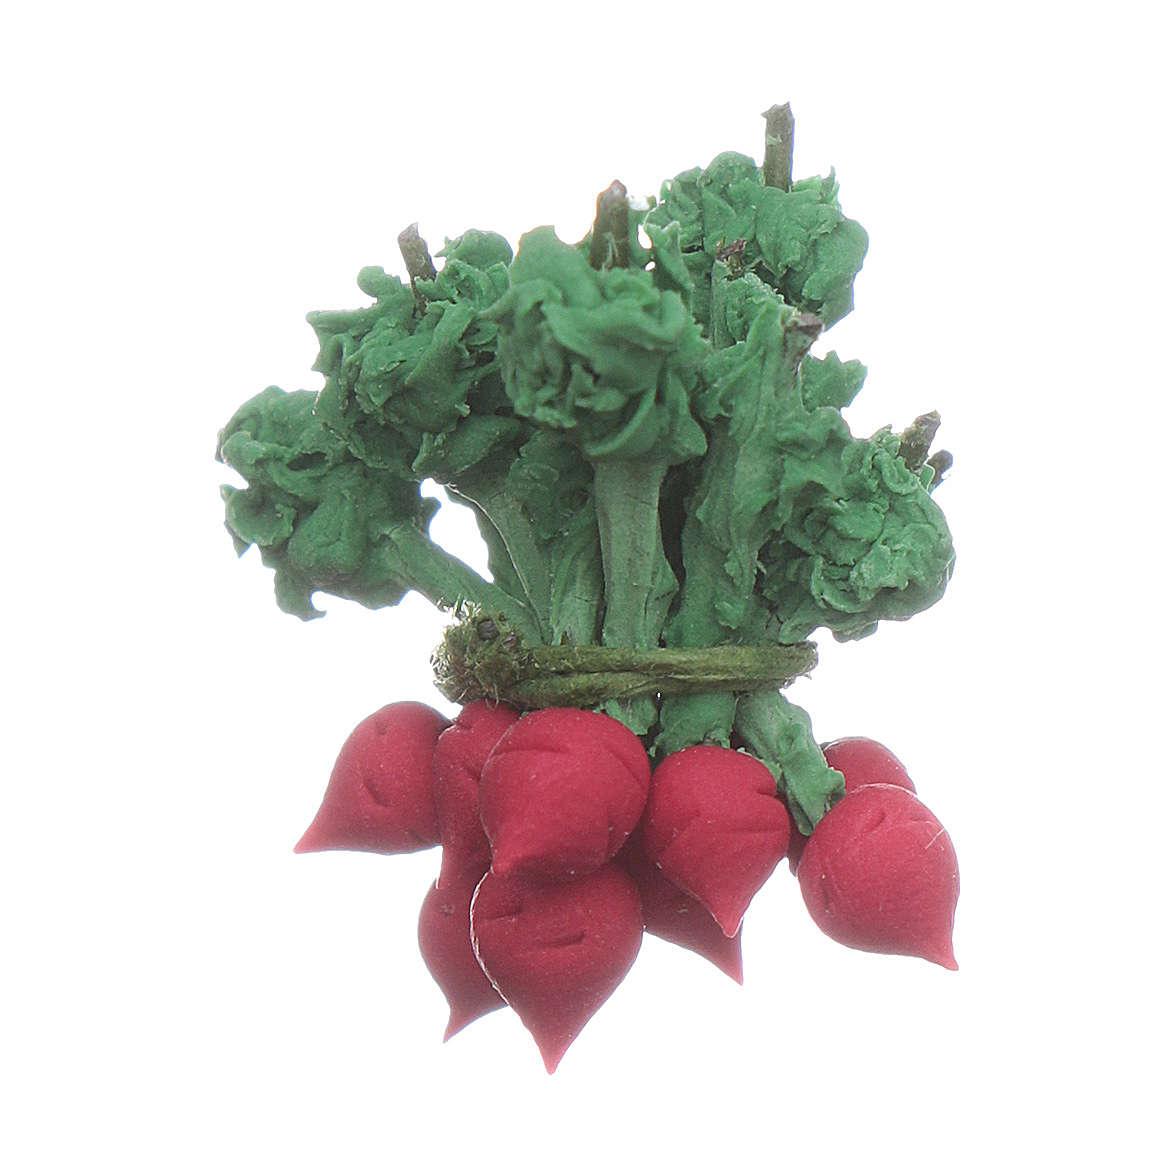 Red radish for DIY nativities 4